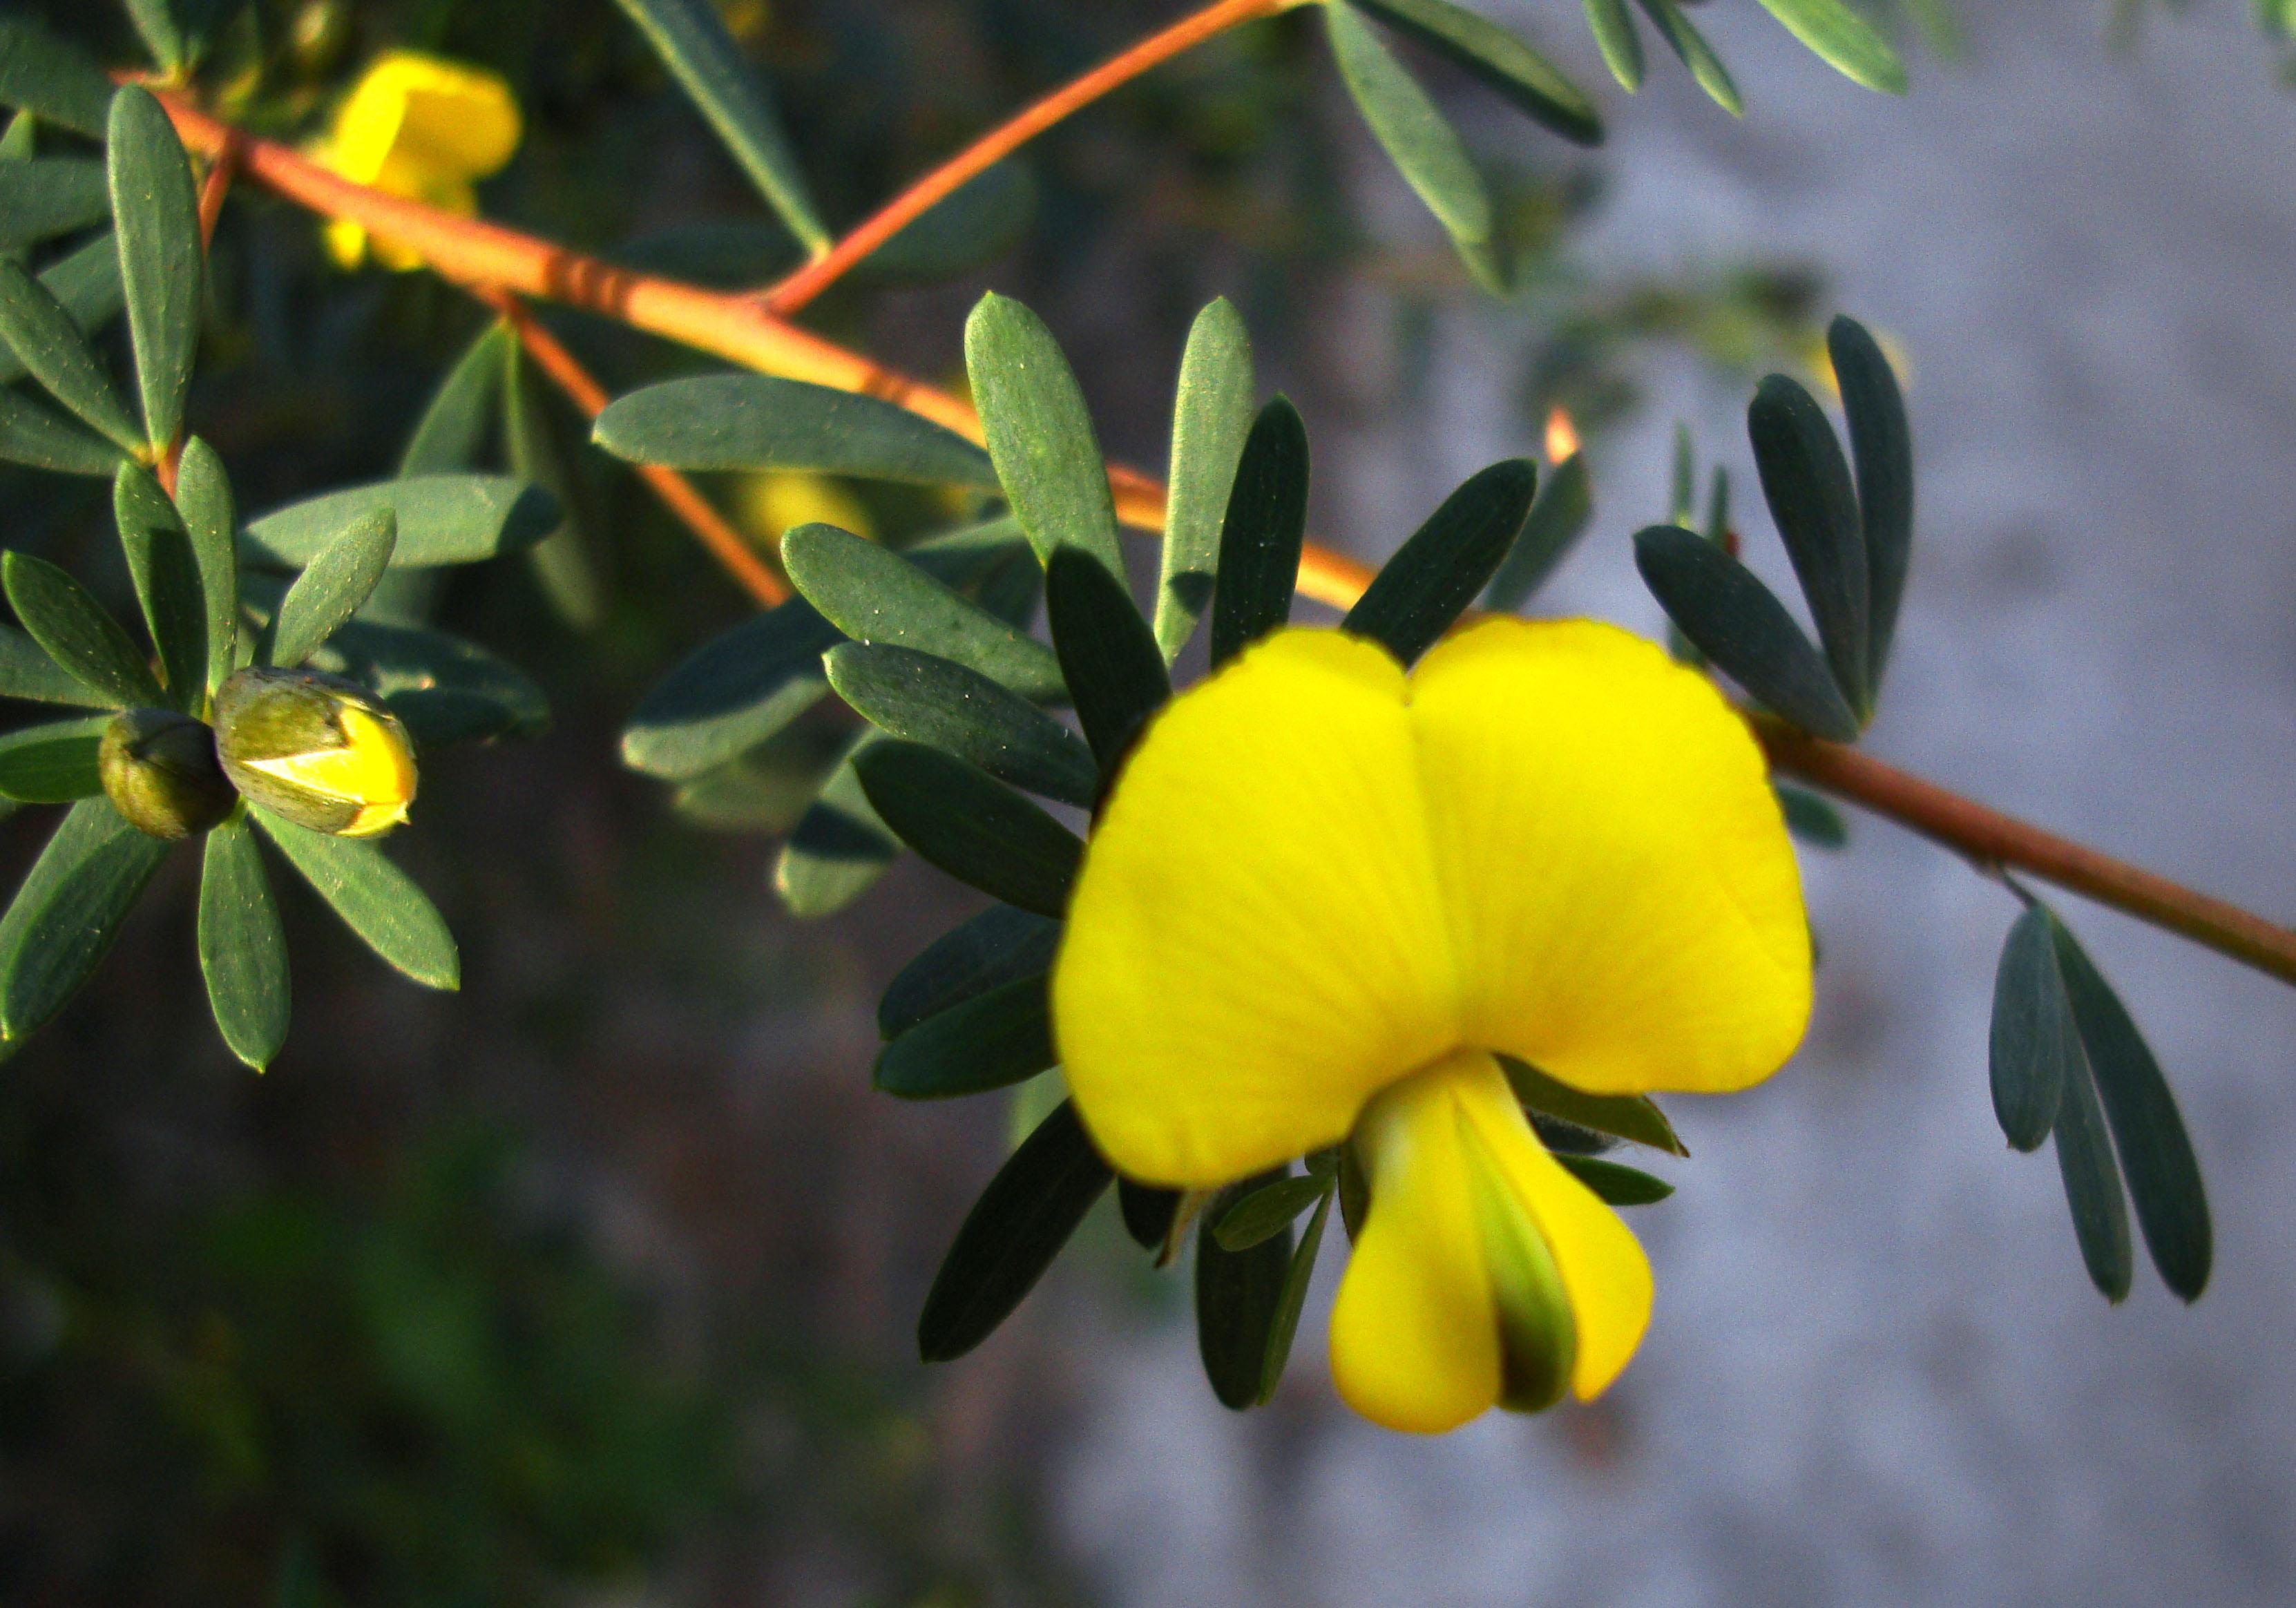 Tiny bush flowers Noosa National Park Qld Australia 20